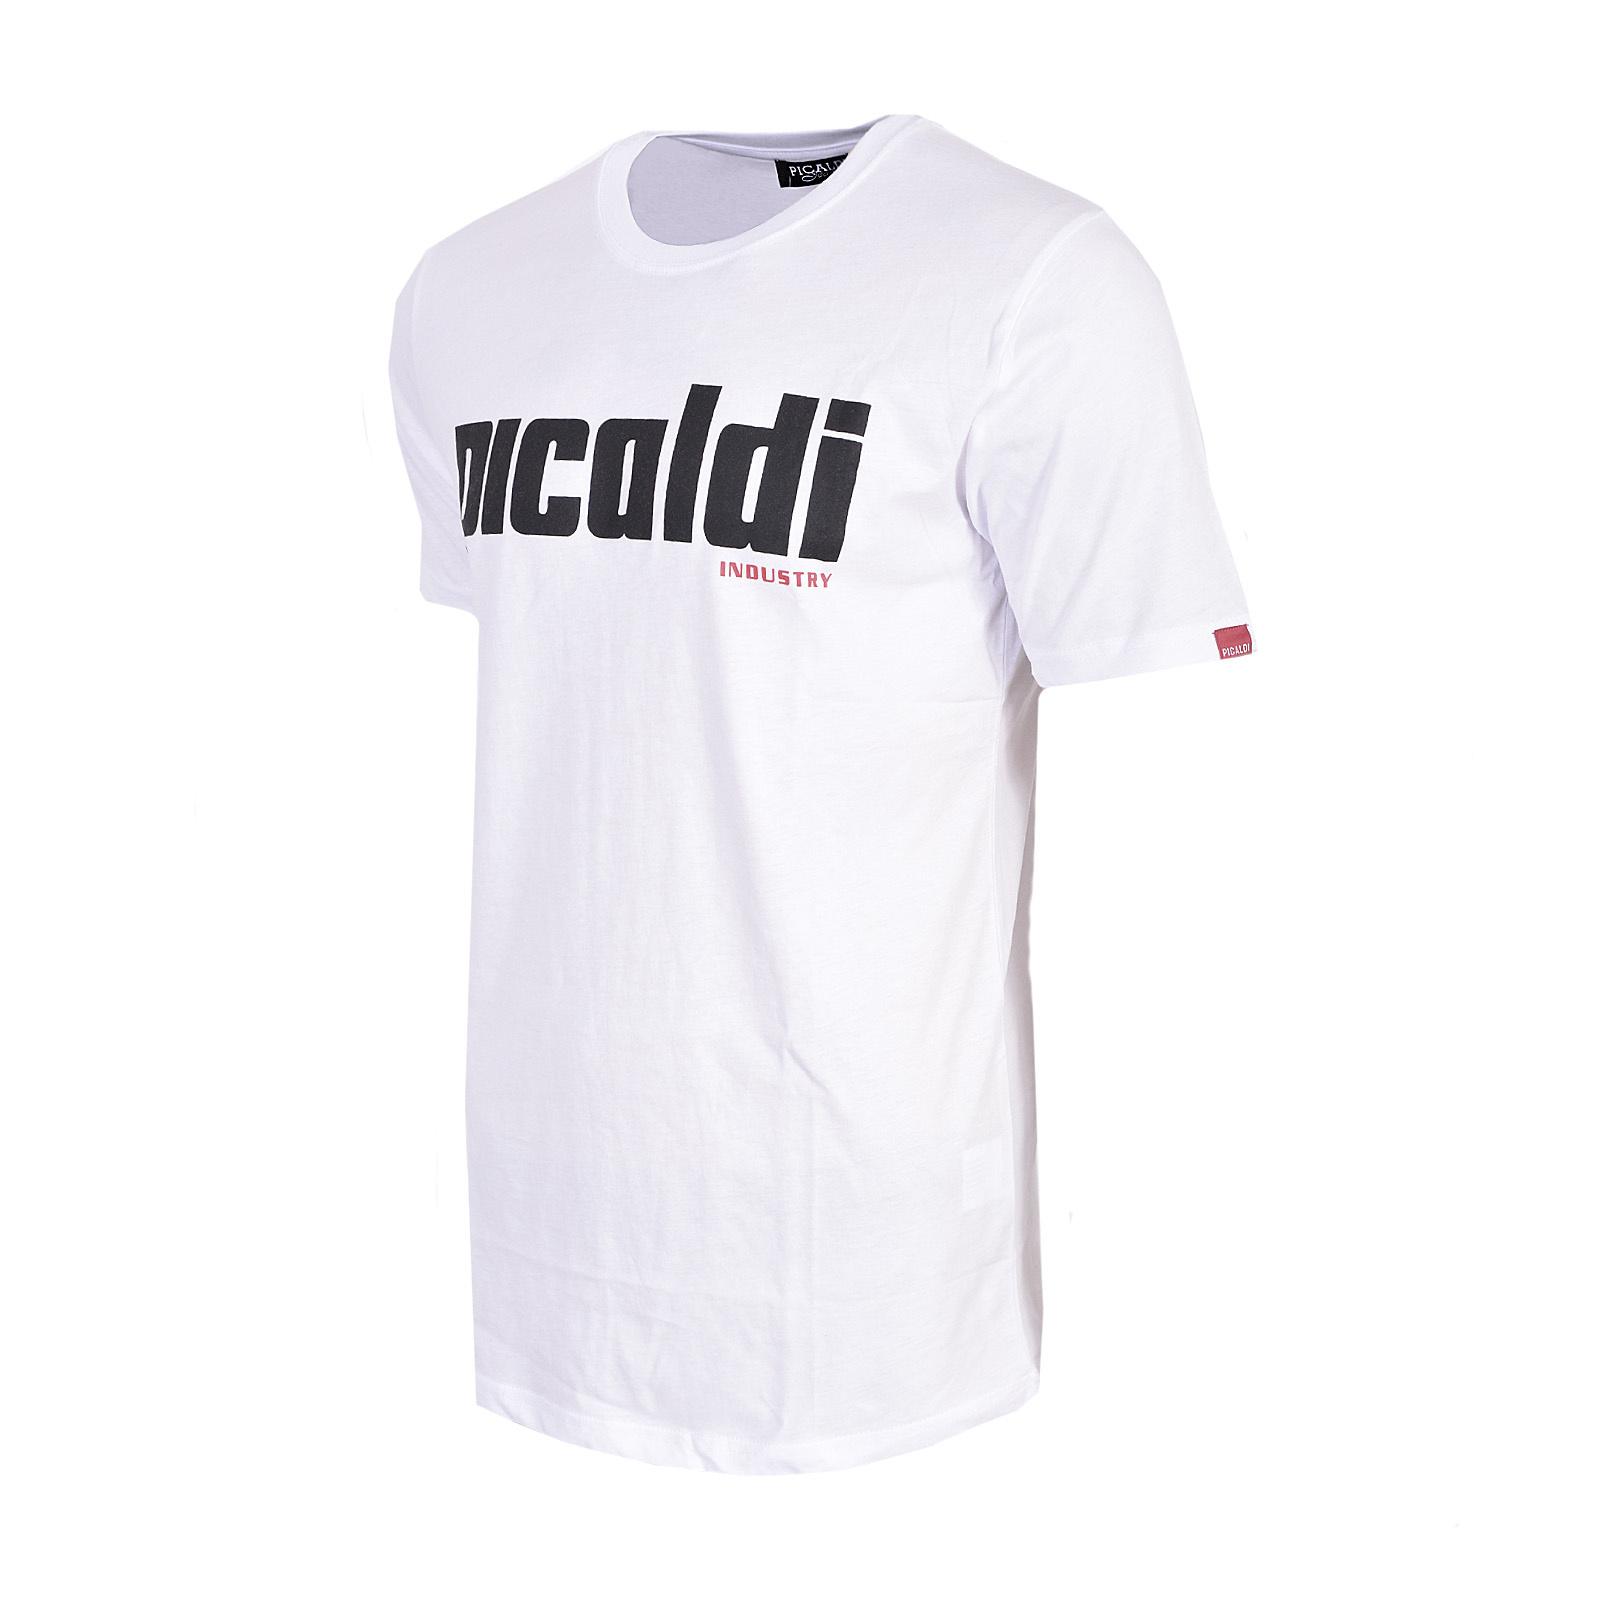 Picaldi Picaldi Shirt - Weiss